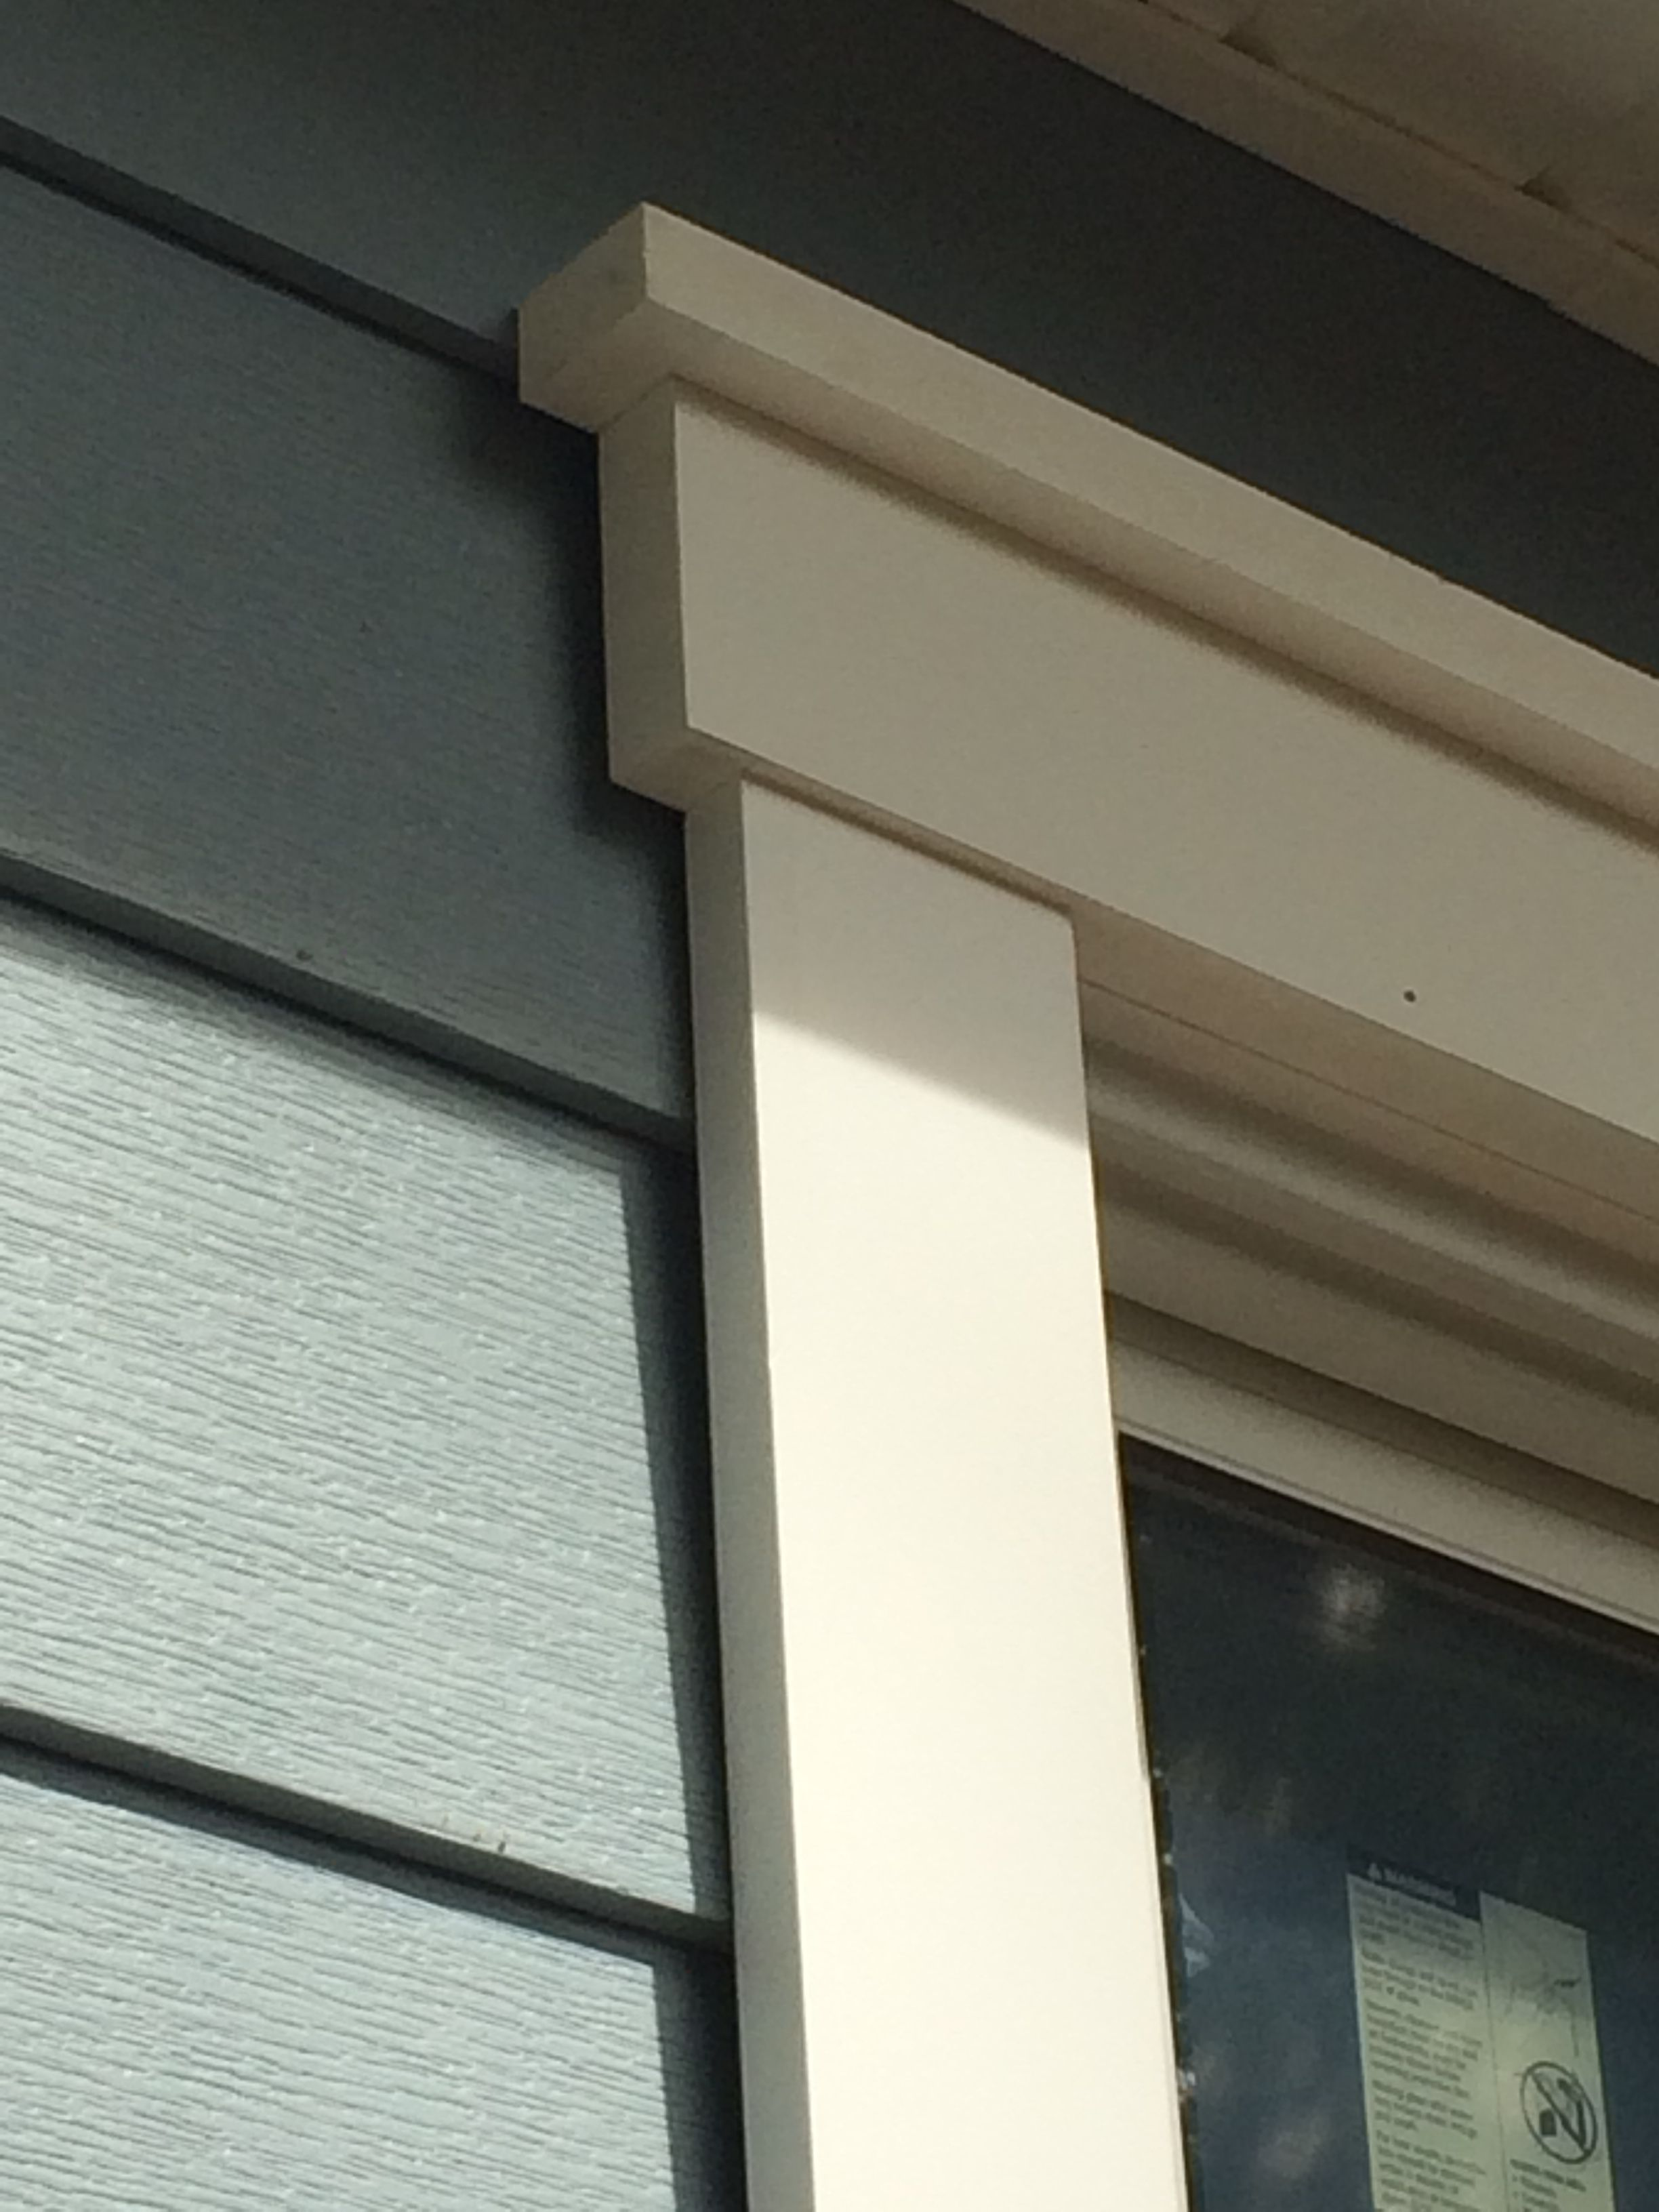 Aluminum Trim For Exterior Doors : Siding companies hawthorne find contractor